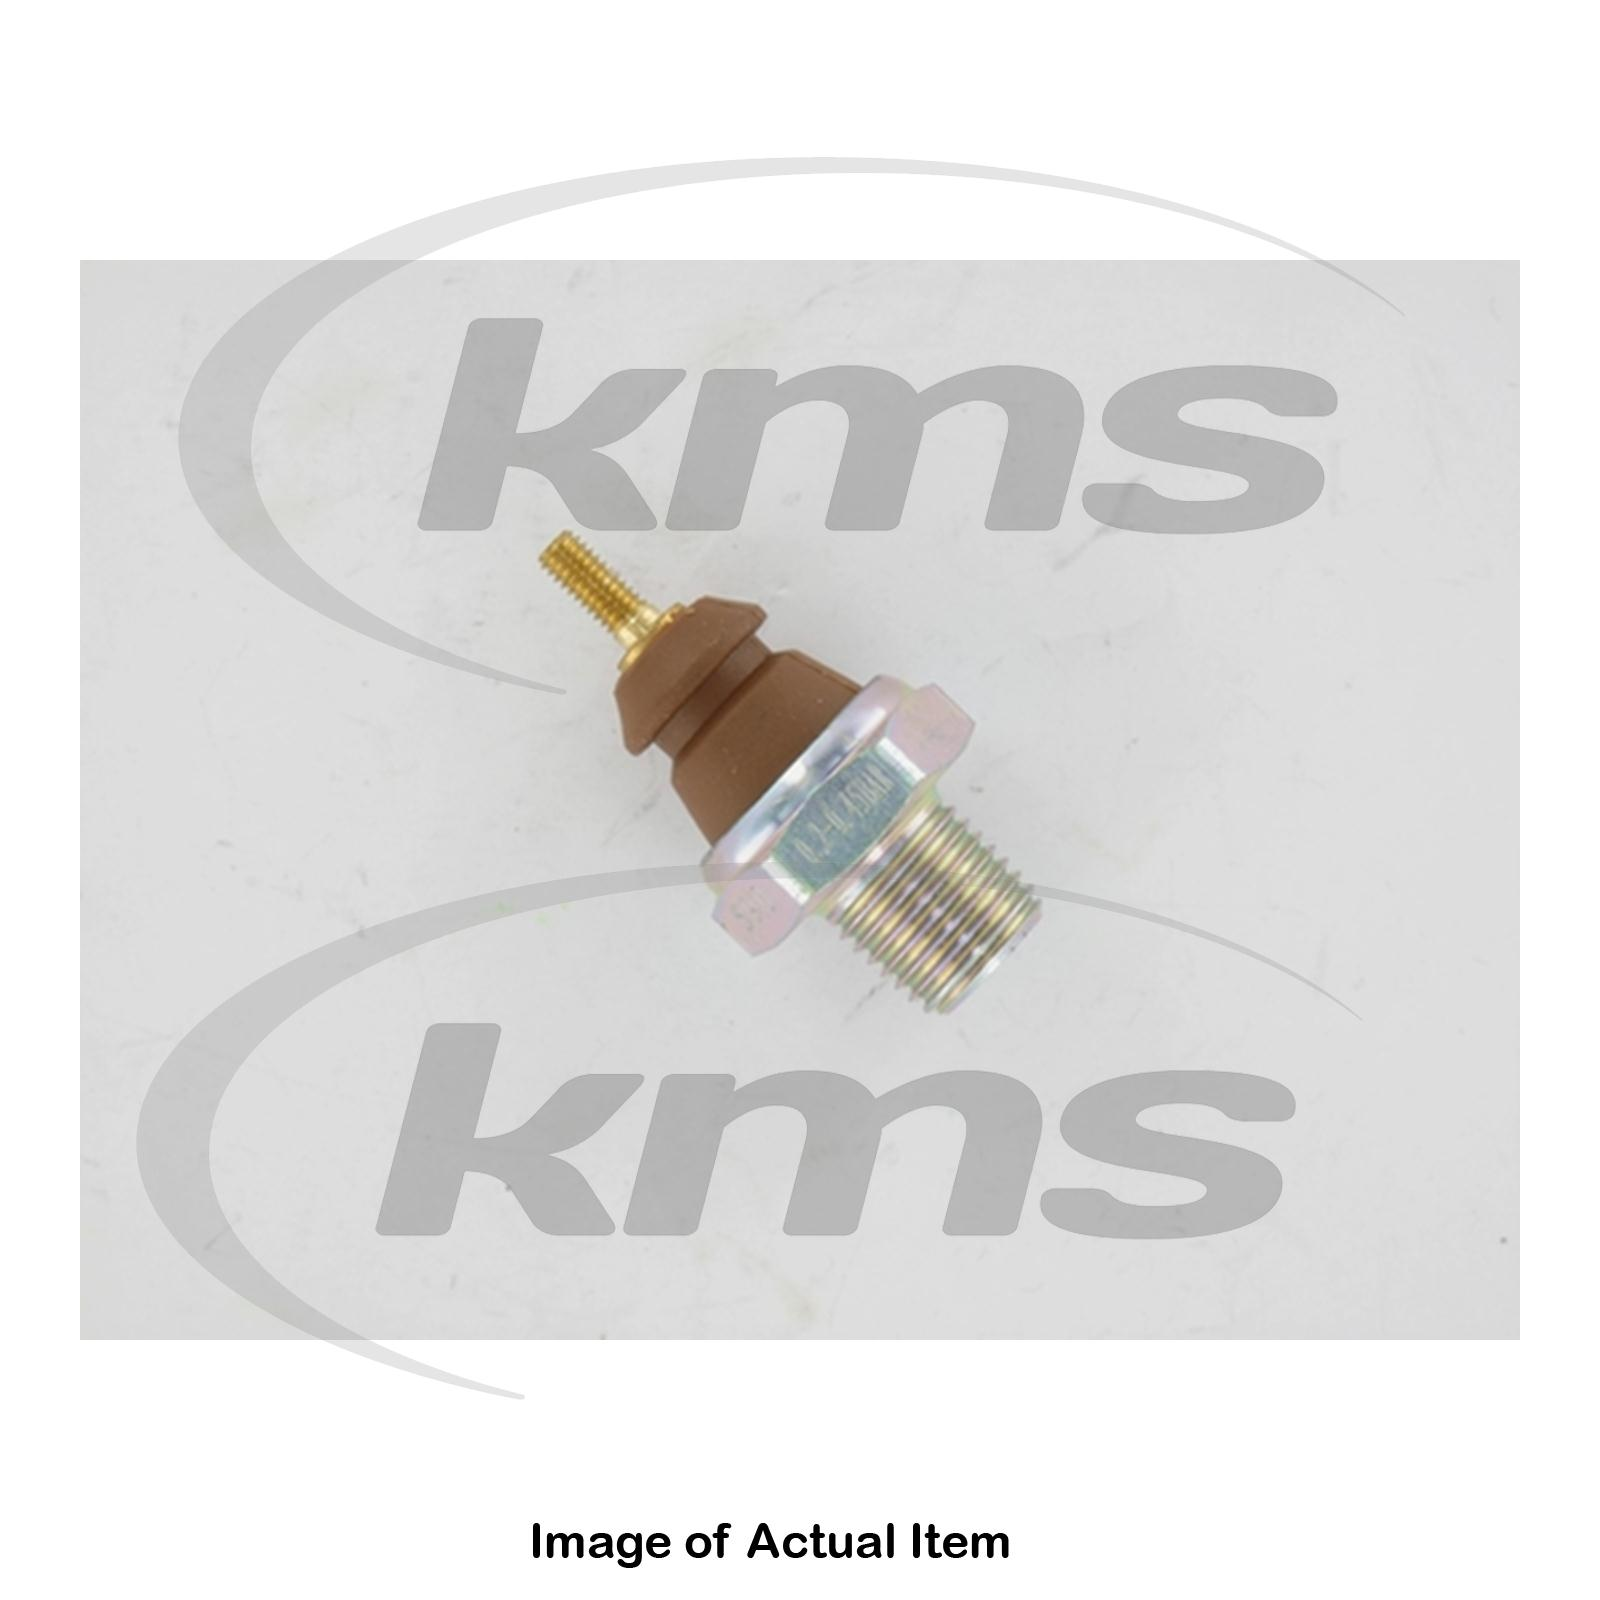 New Genuine Lucas Oil Pressure Sender Unit Sob802 Top Quality Vdo Wiring Sentinel